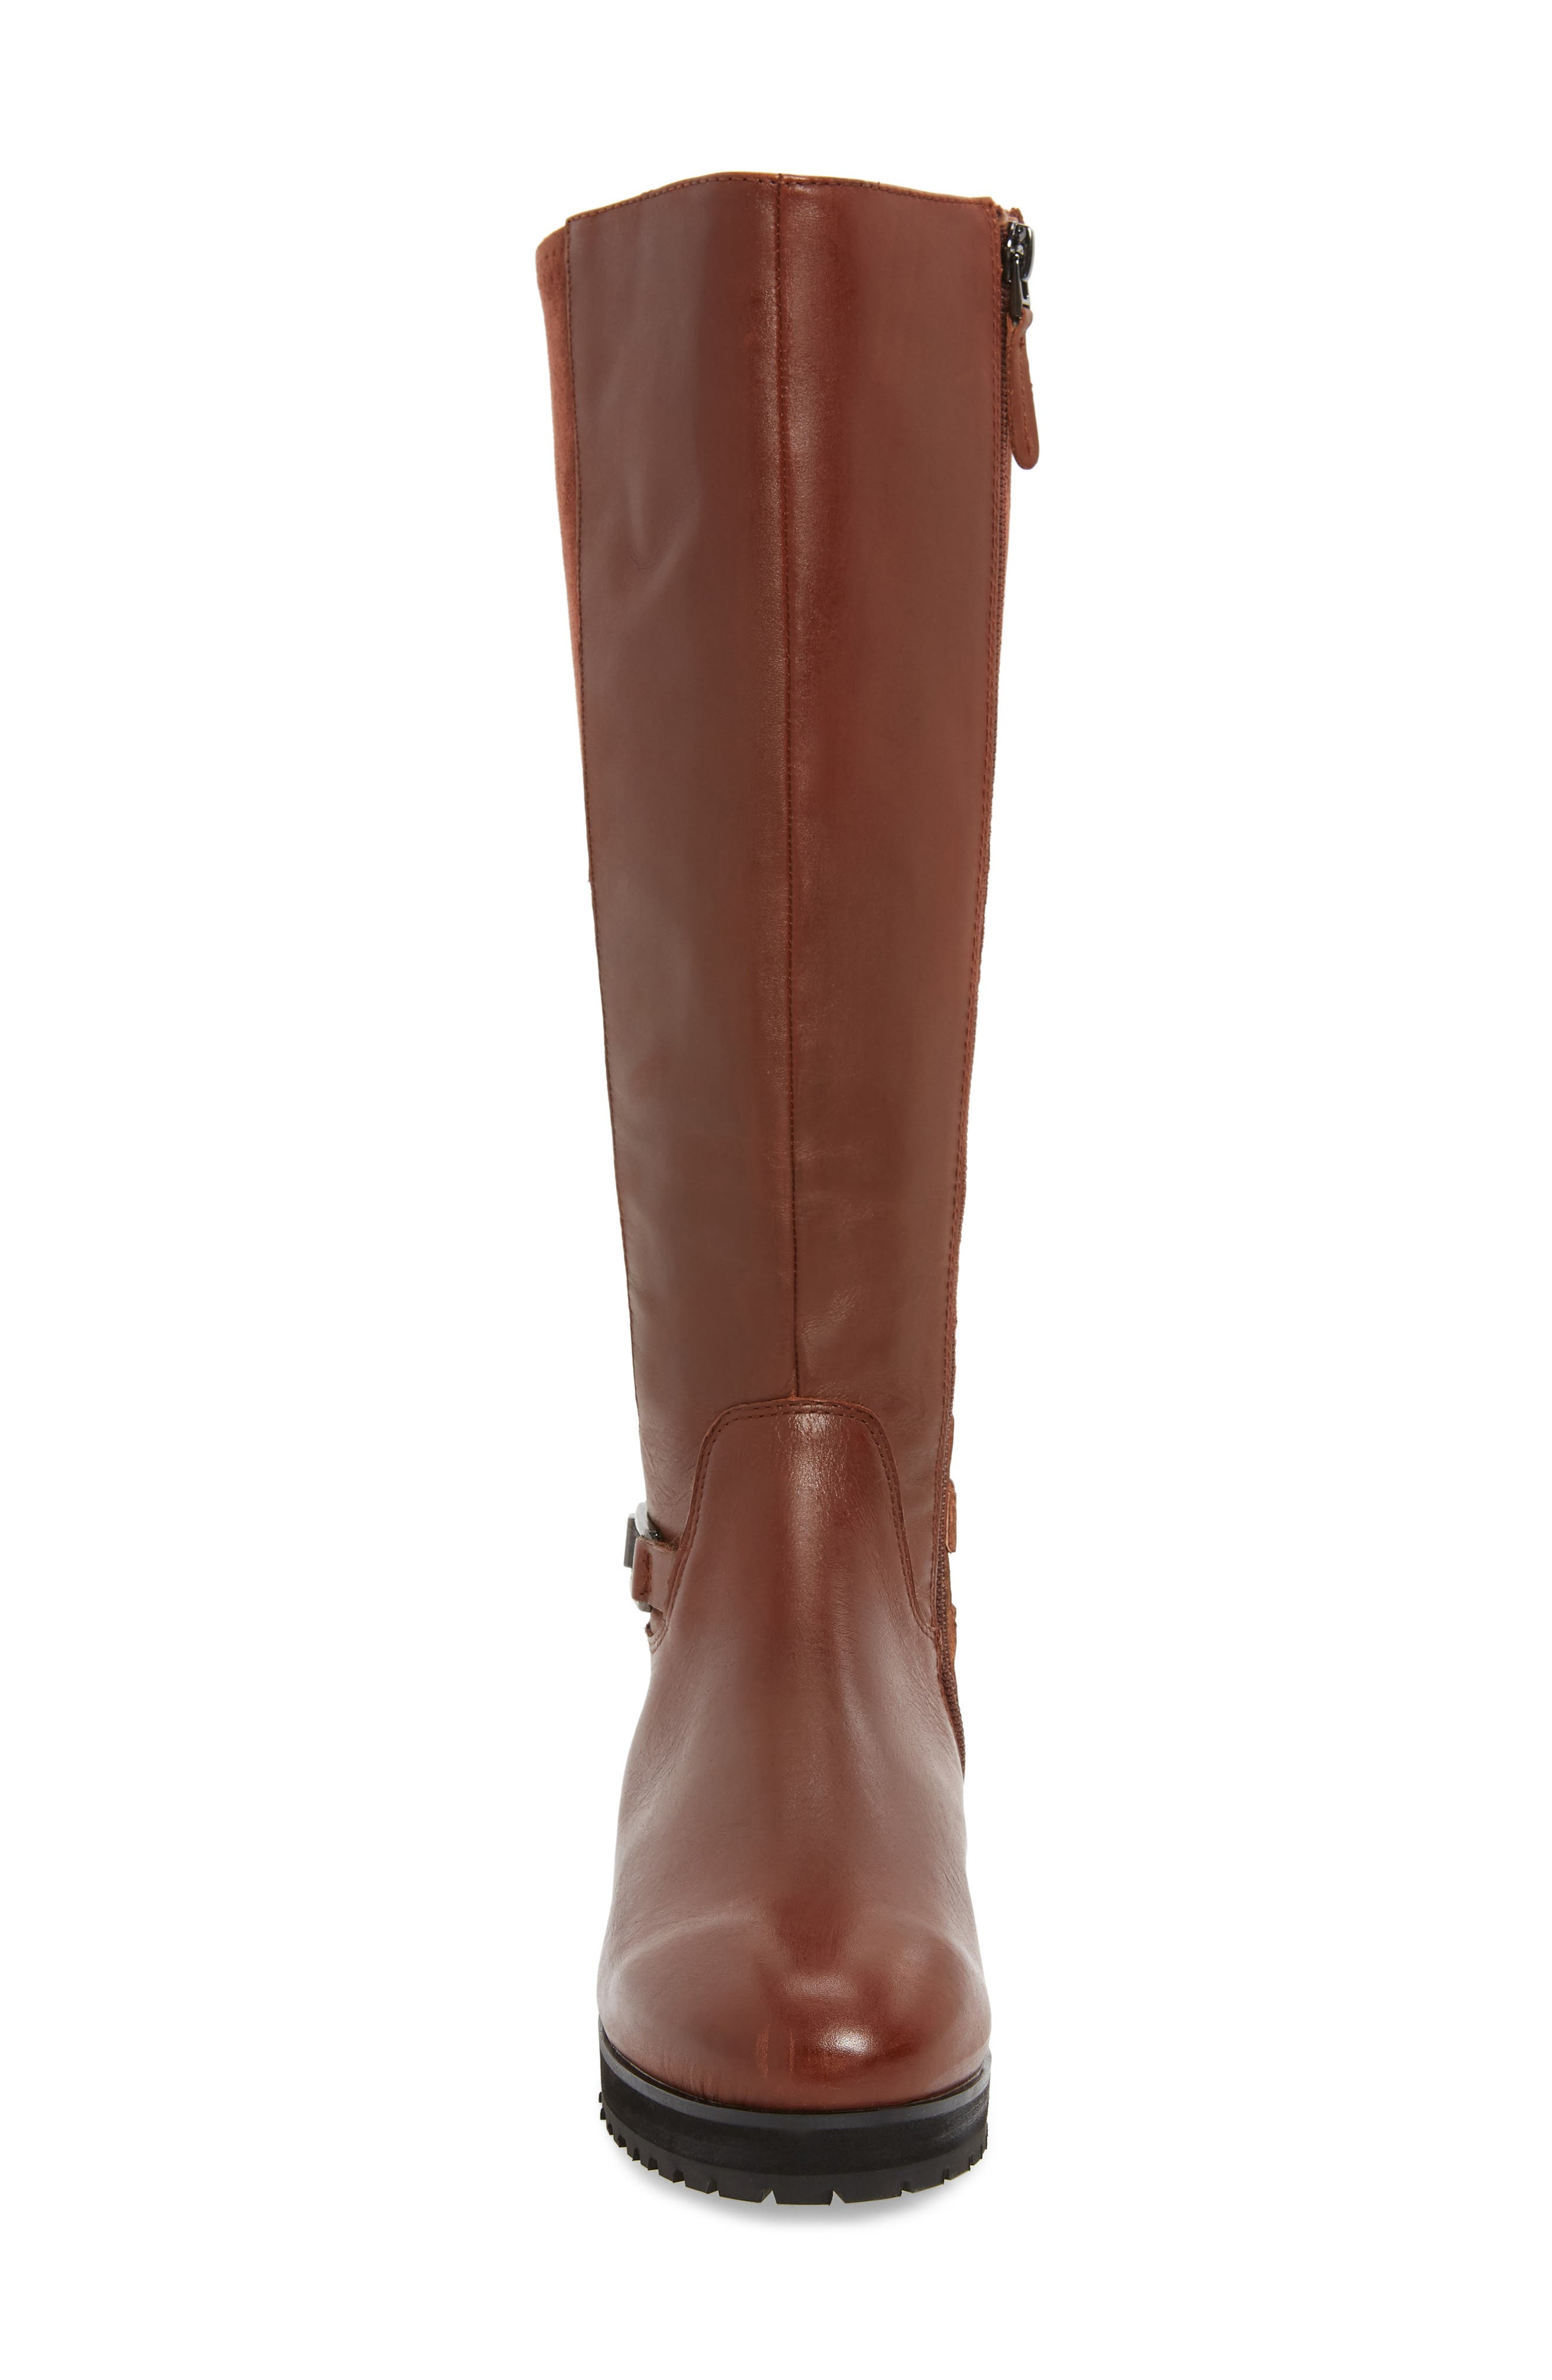 Frida Waterproof Knee High Boot,                             Alternate thumbnail 4, color,                             COGNAC